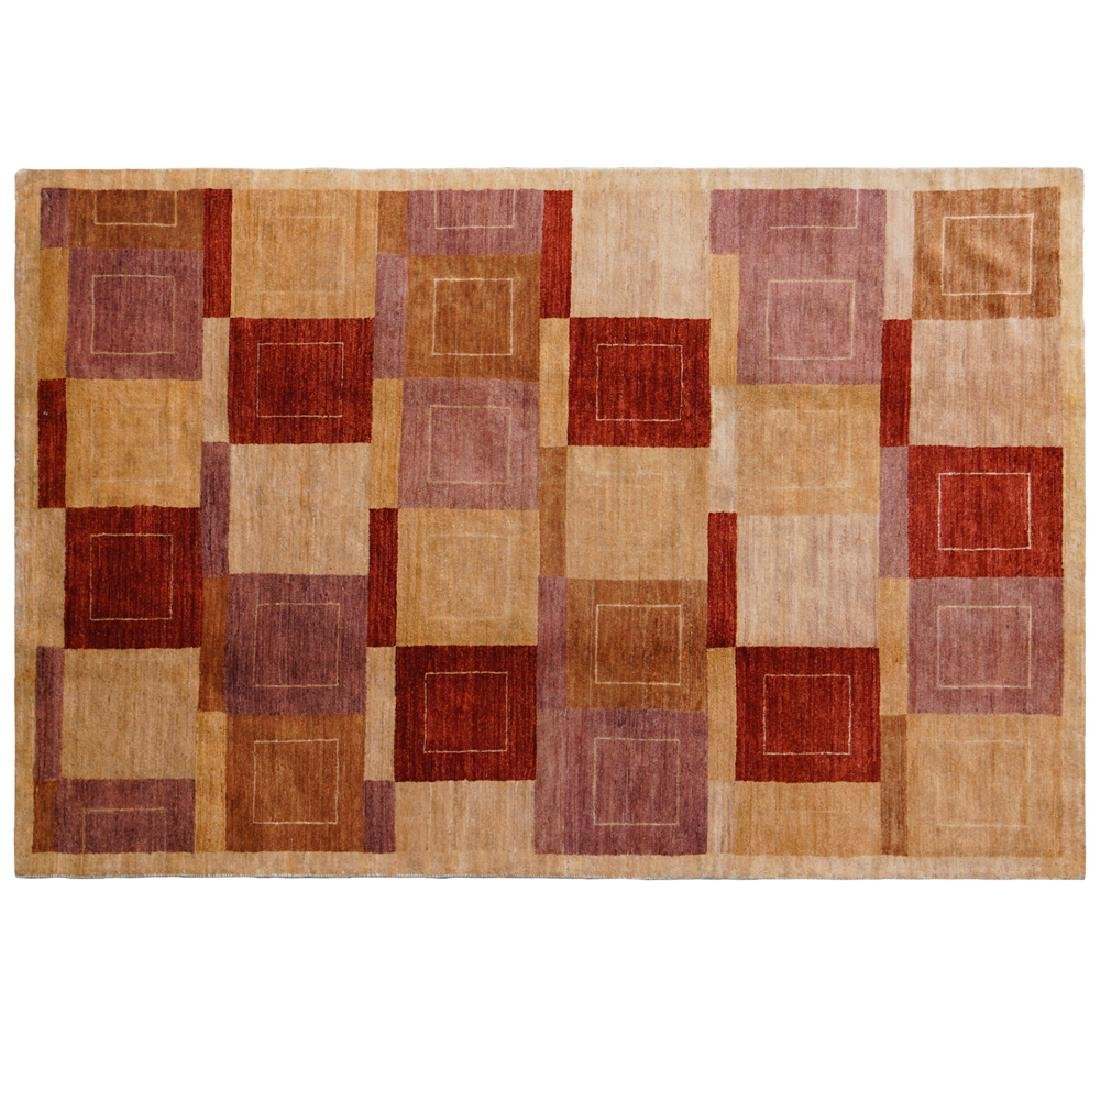 Gabbeh decorative carpet Pakistan 20th century